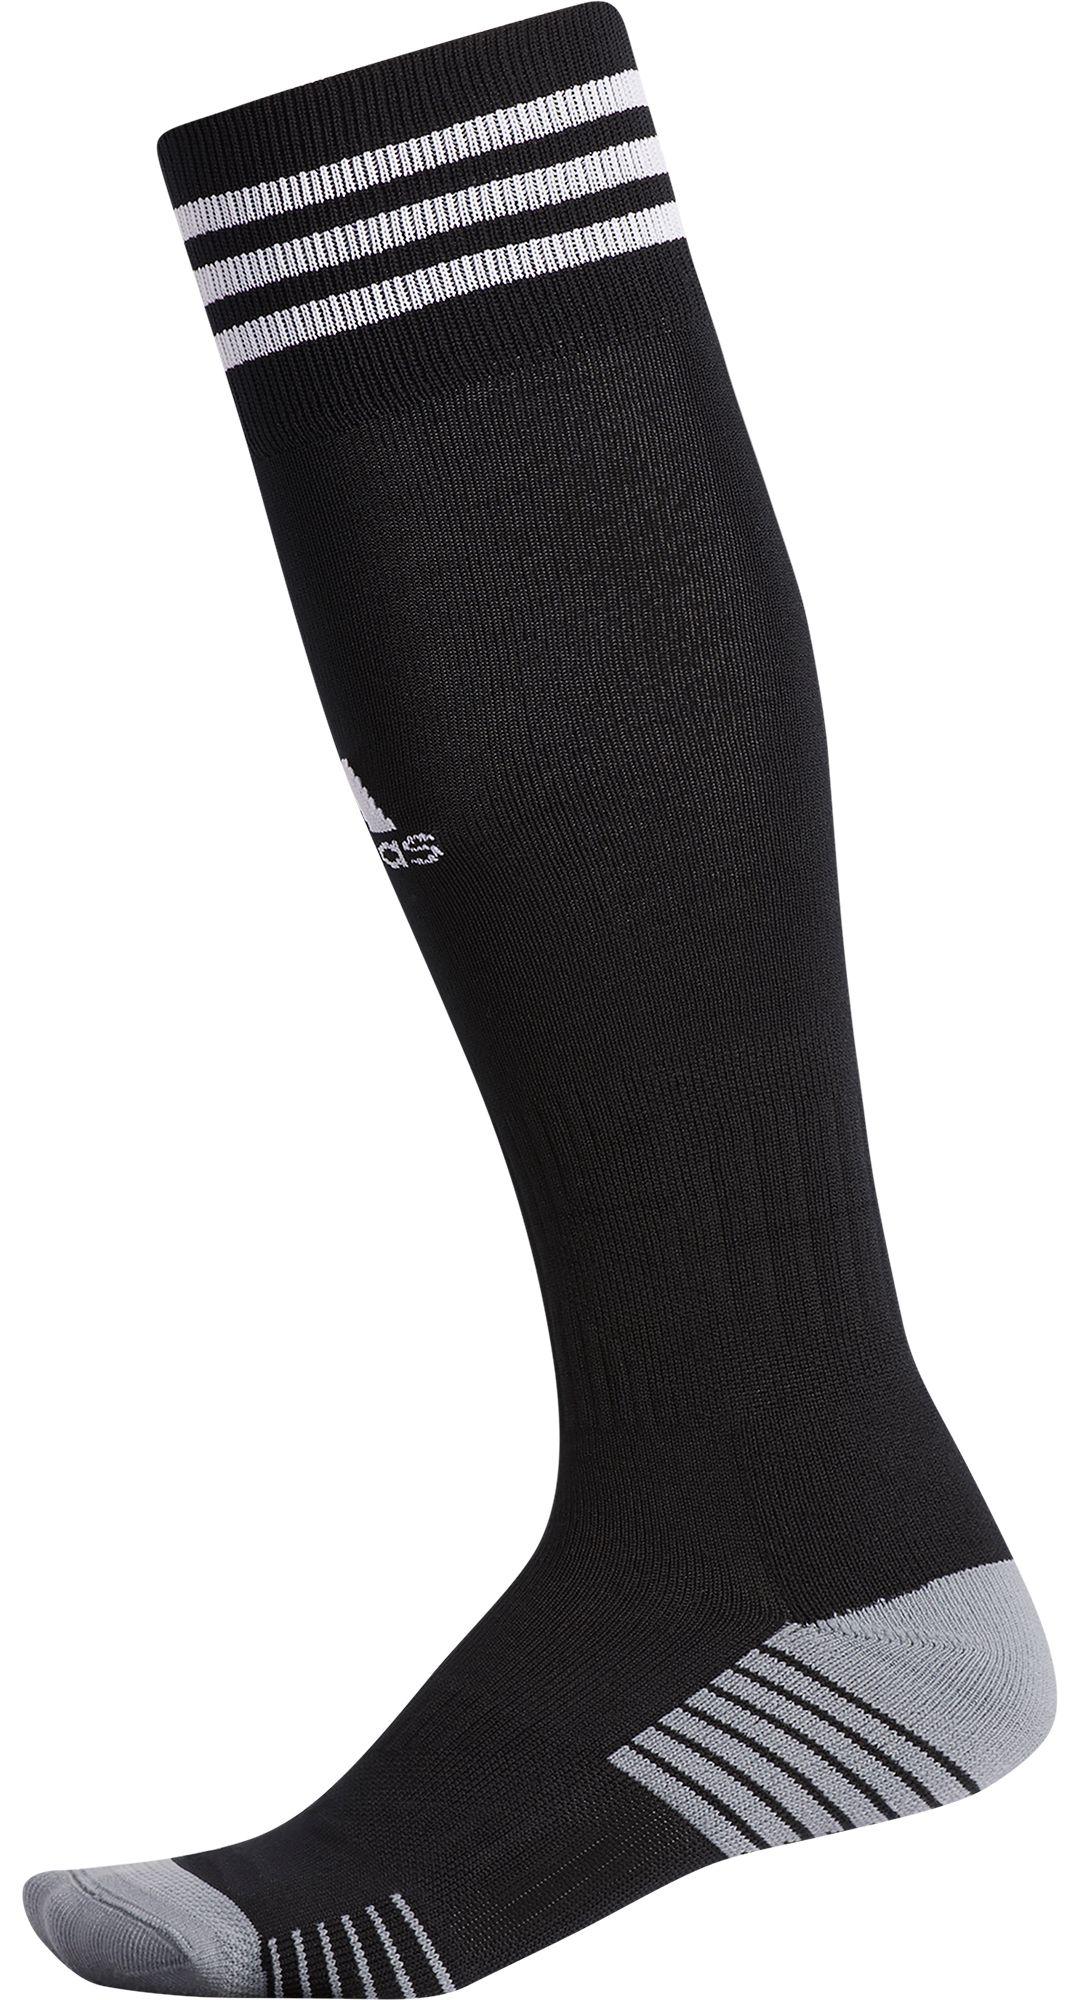 6213185ea Adidas Copa Zone Cushion IV OTC Socks | DICK'S Sporting Goods